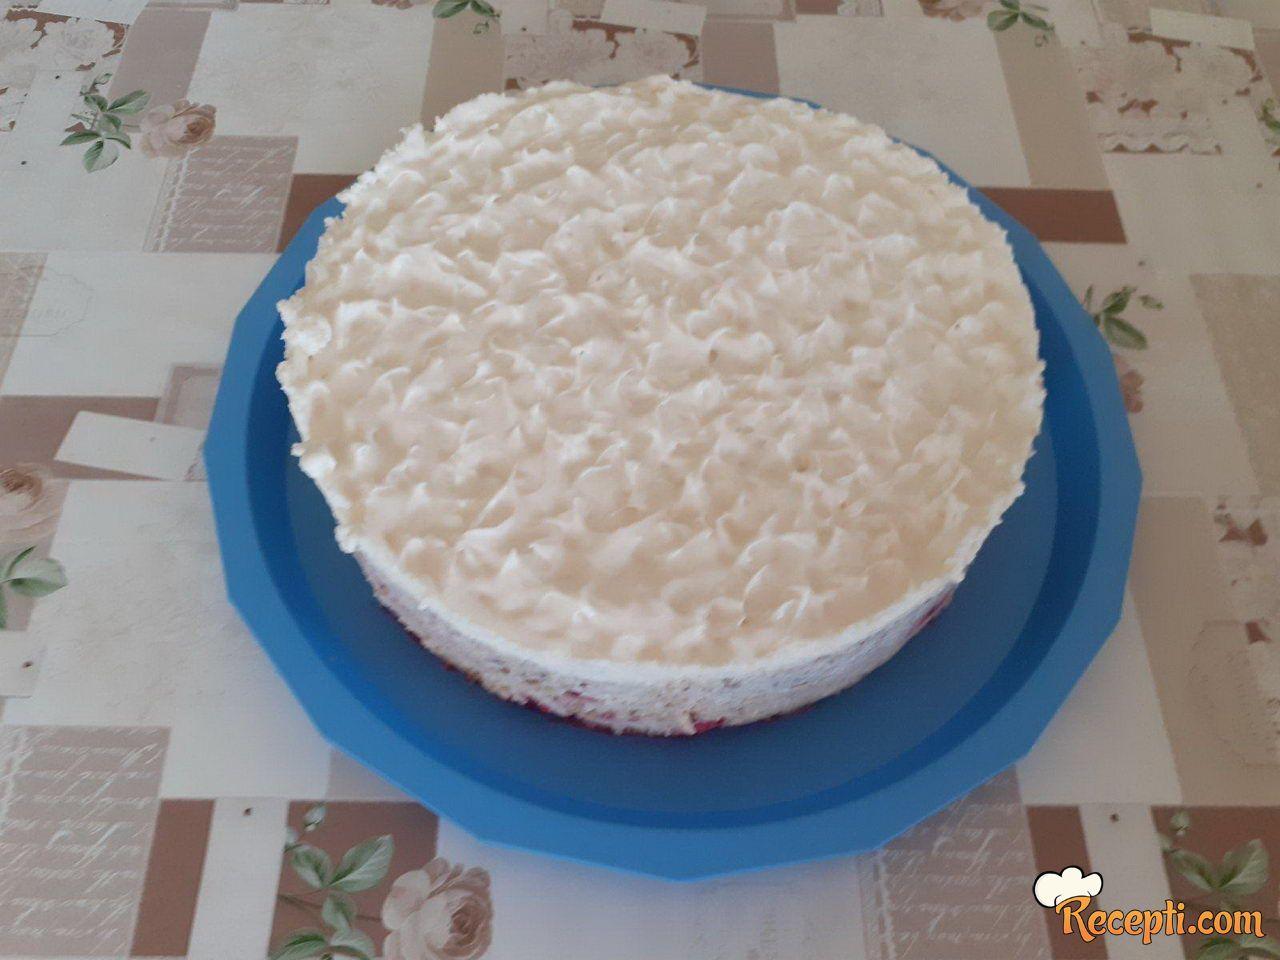 Anđelina rođendanska torta